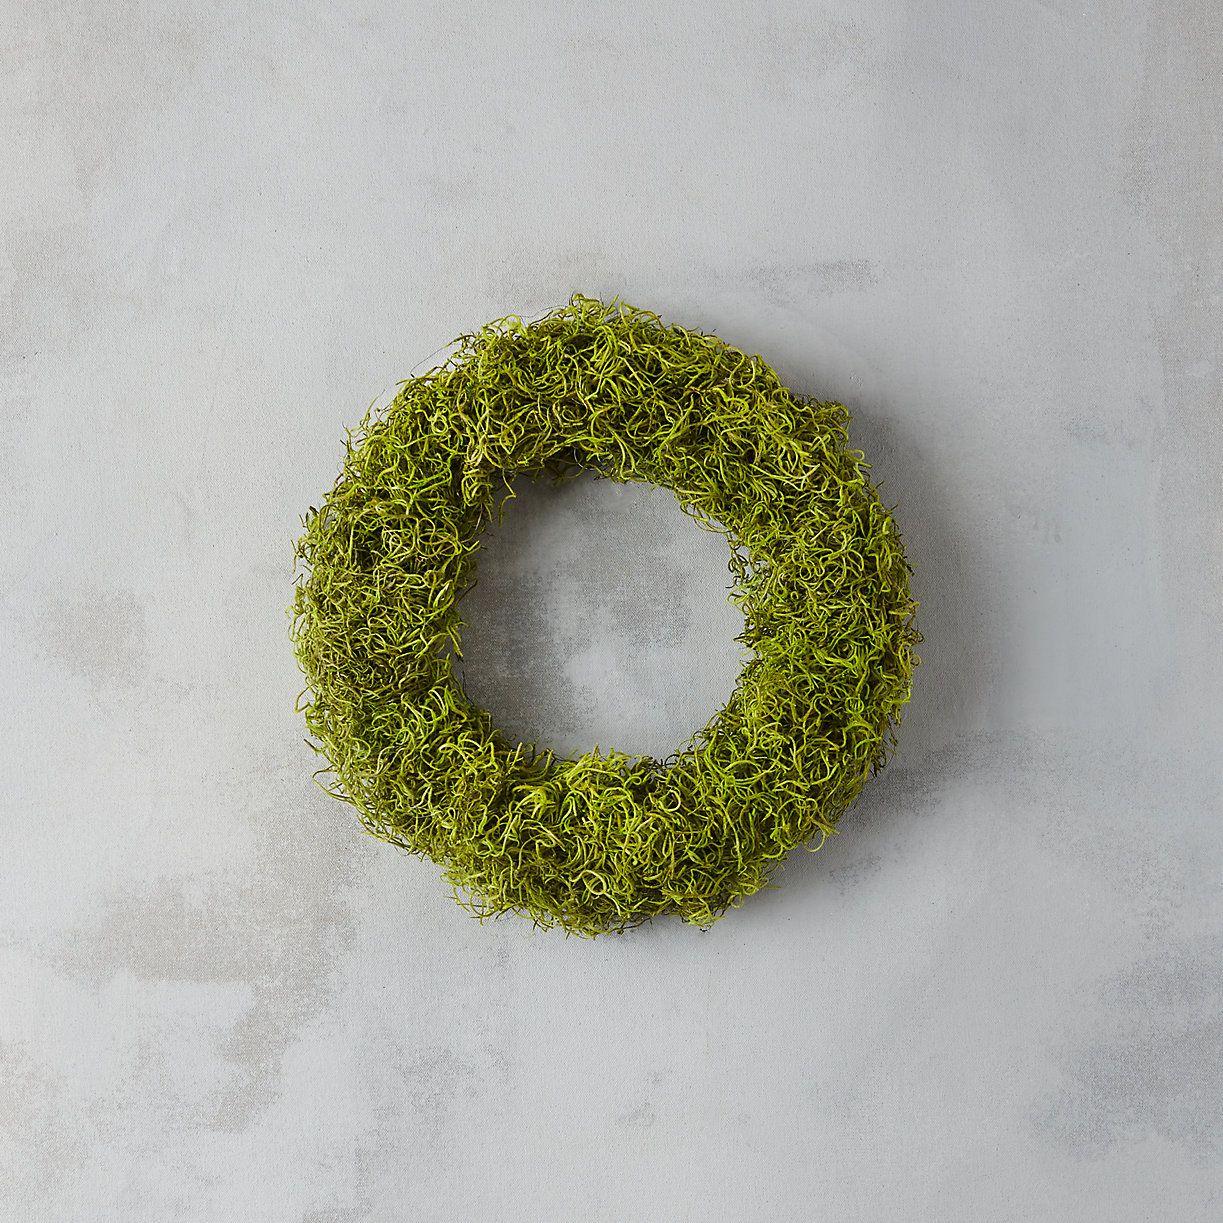 preserved spanish moss wreath affiliatelink ad affiliate